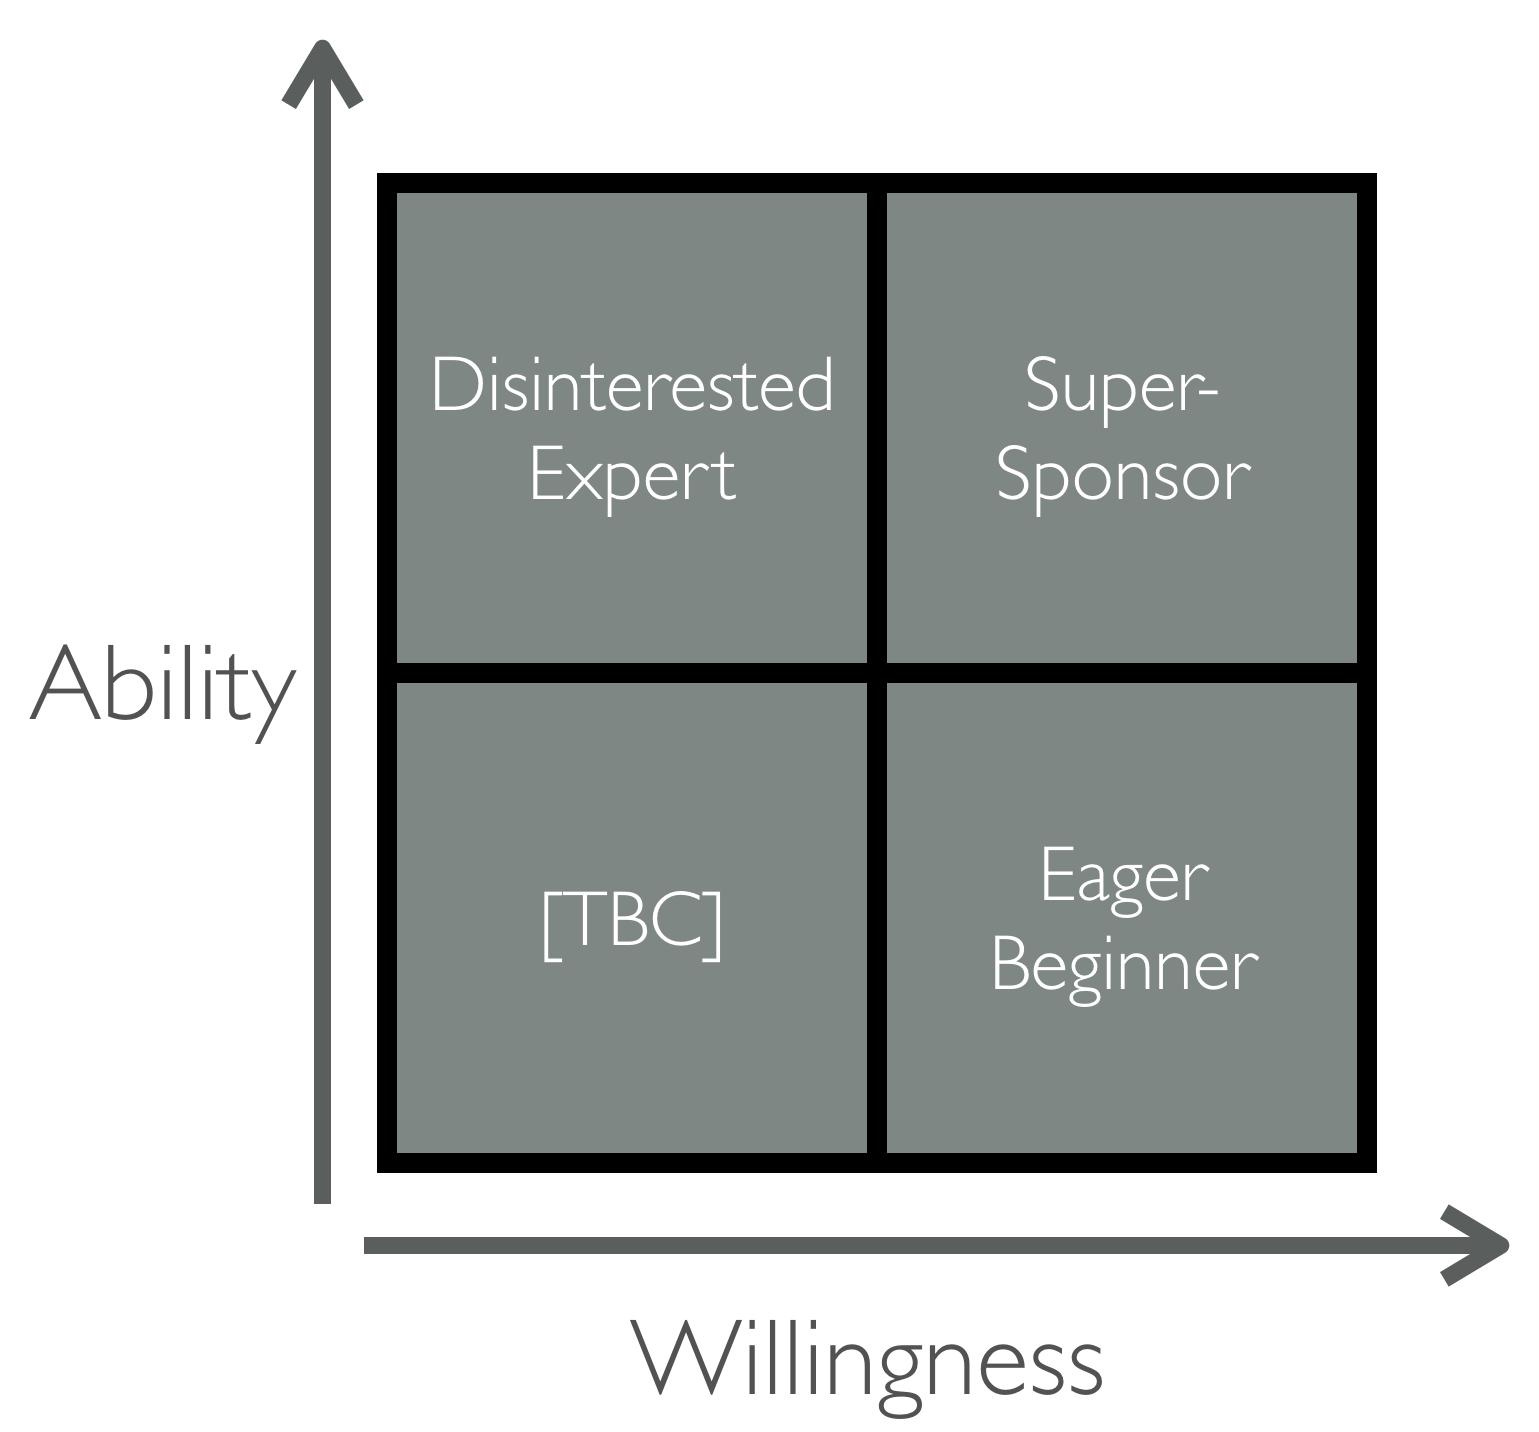 ability_willingness_matrix